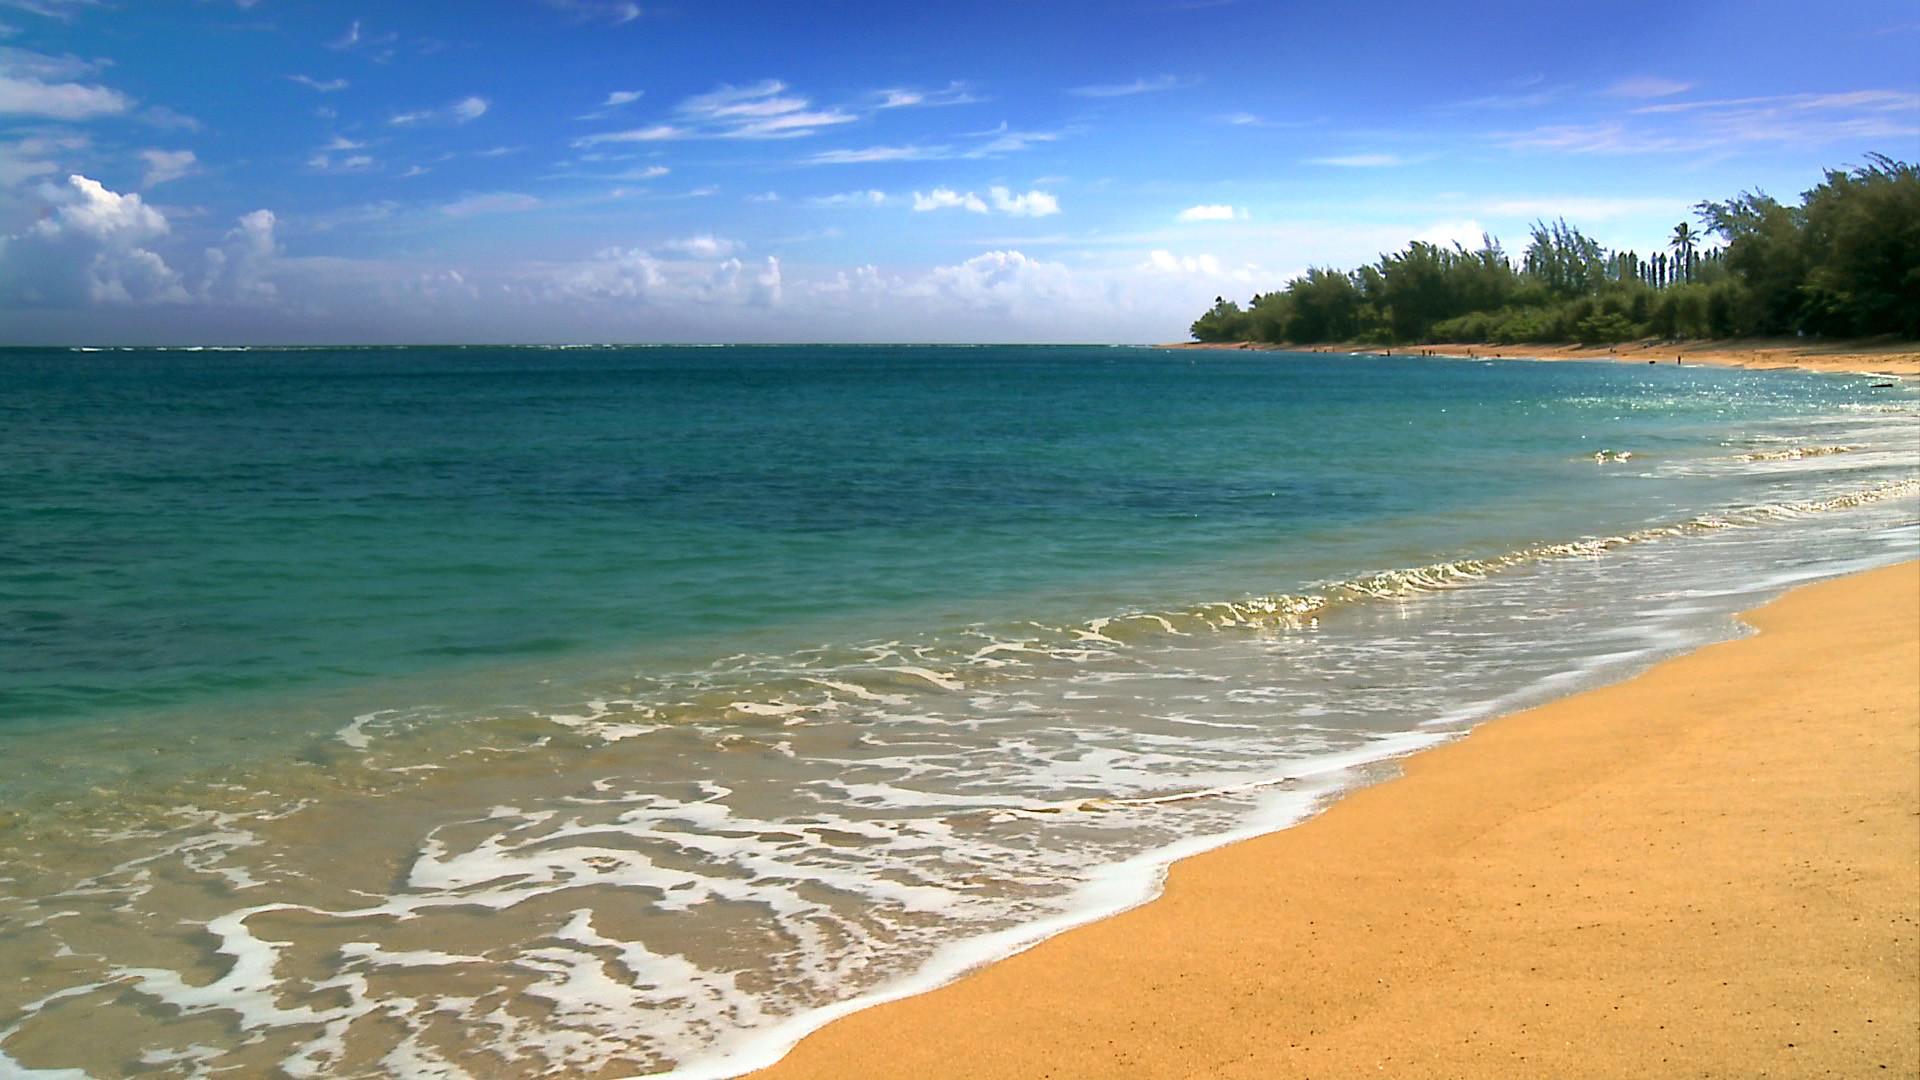 hawaii, photos, nature, background, beach, beaches, media, webshots .